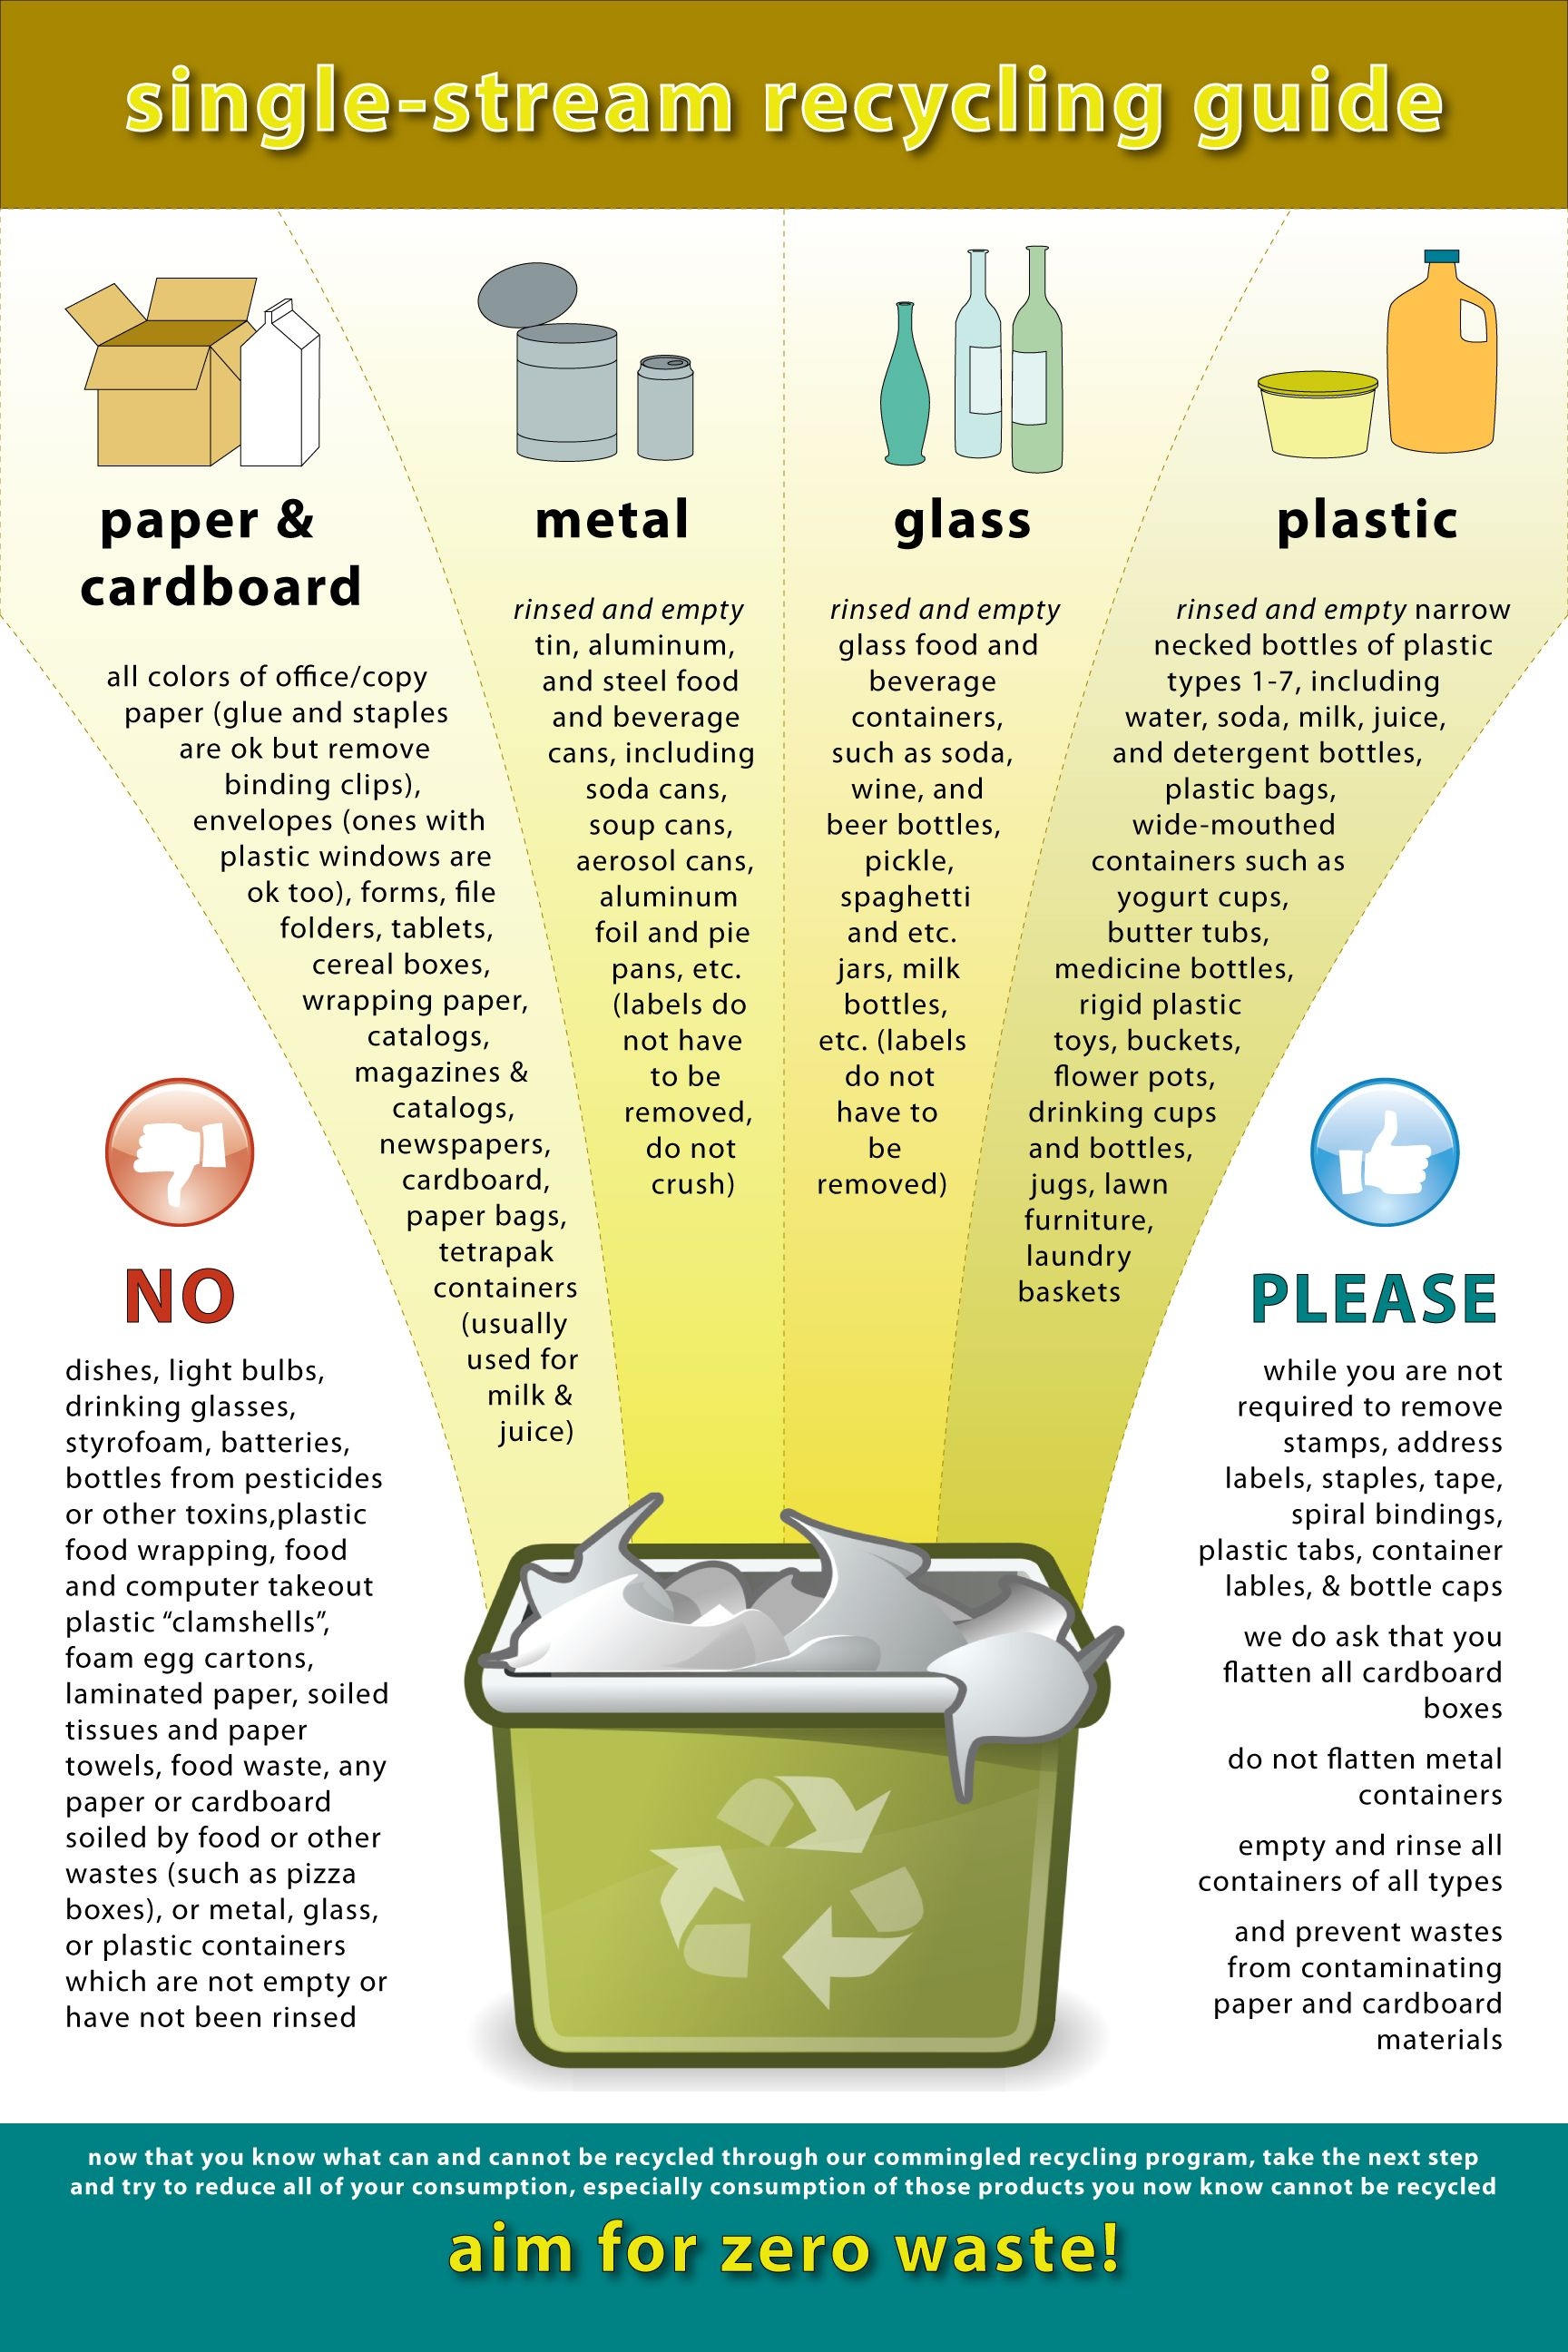 Recycling Capabilities Vary By Jurisdiction But I Made